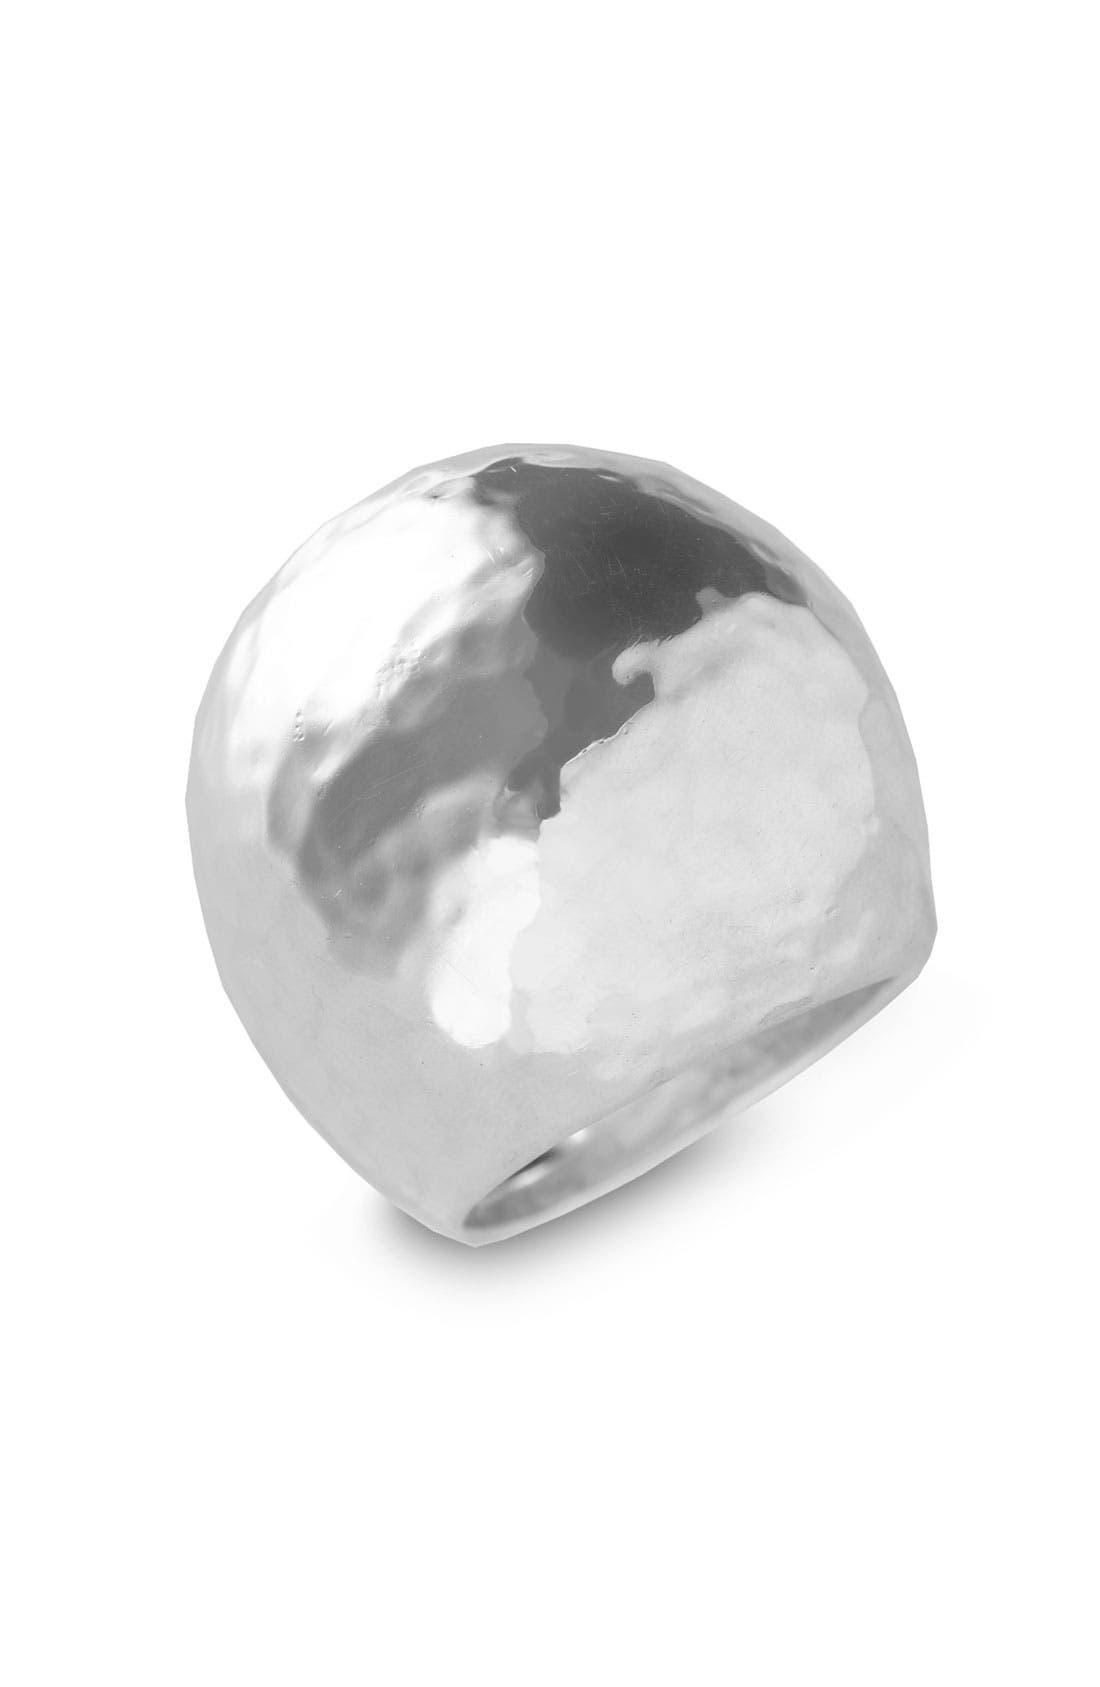 'Glamazon' Large Hammered Dome Ring,                             Main thumbnail 1, color,                             Silver